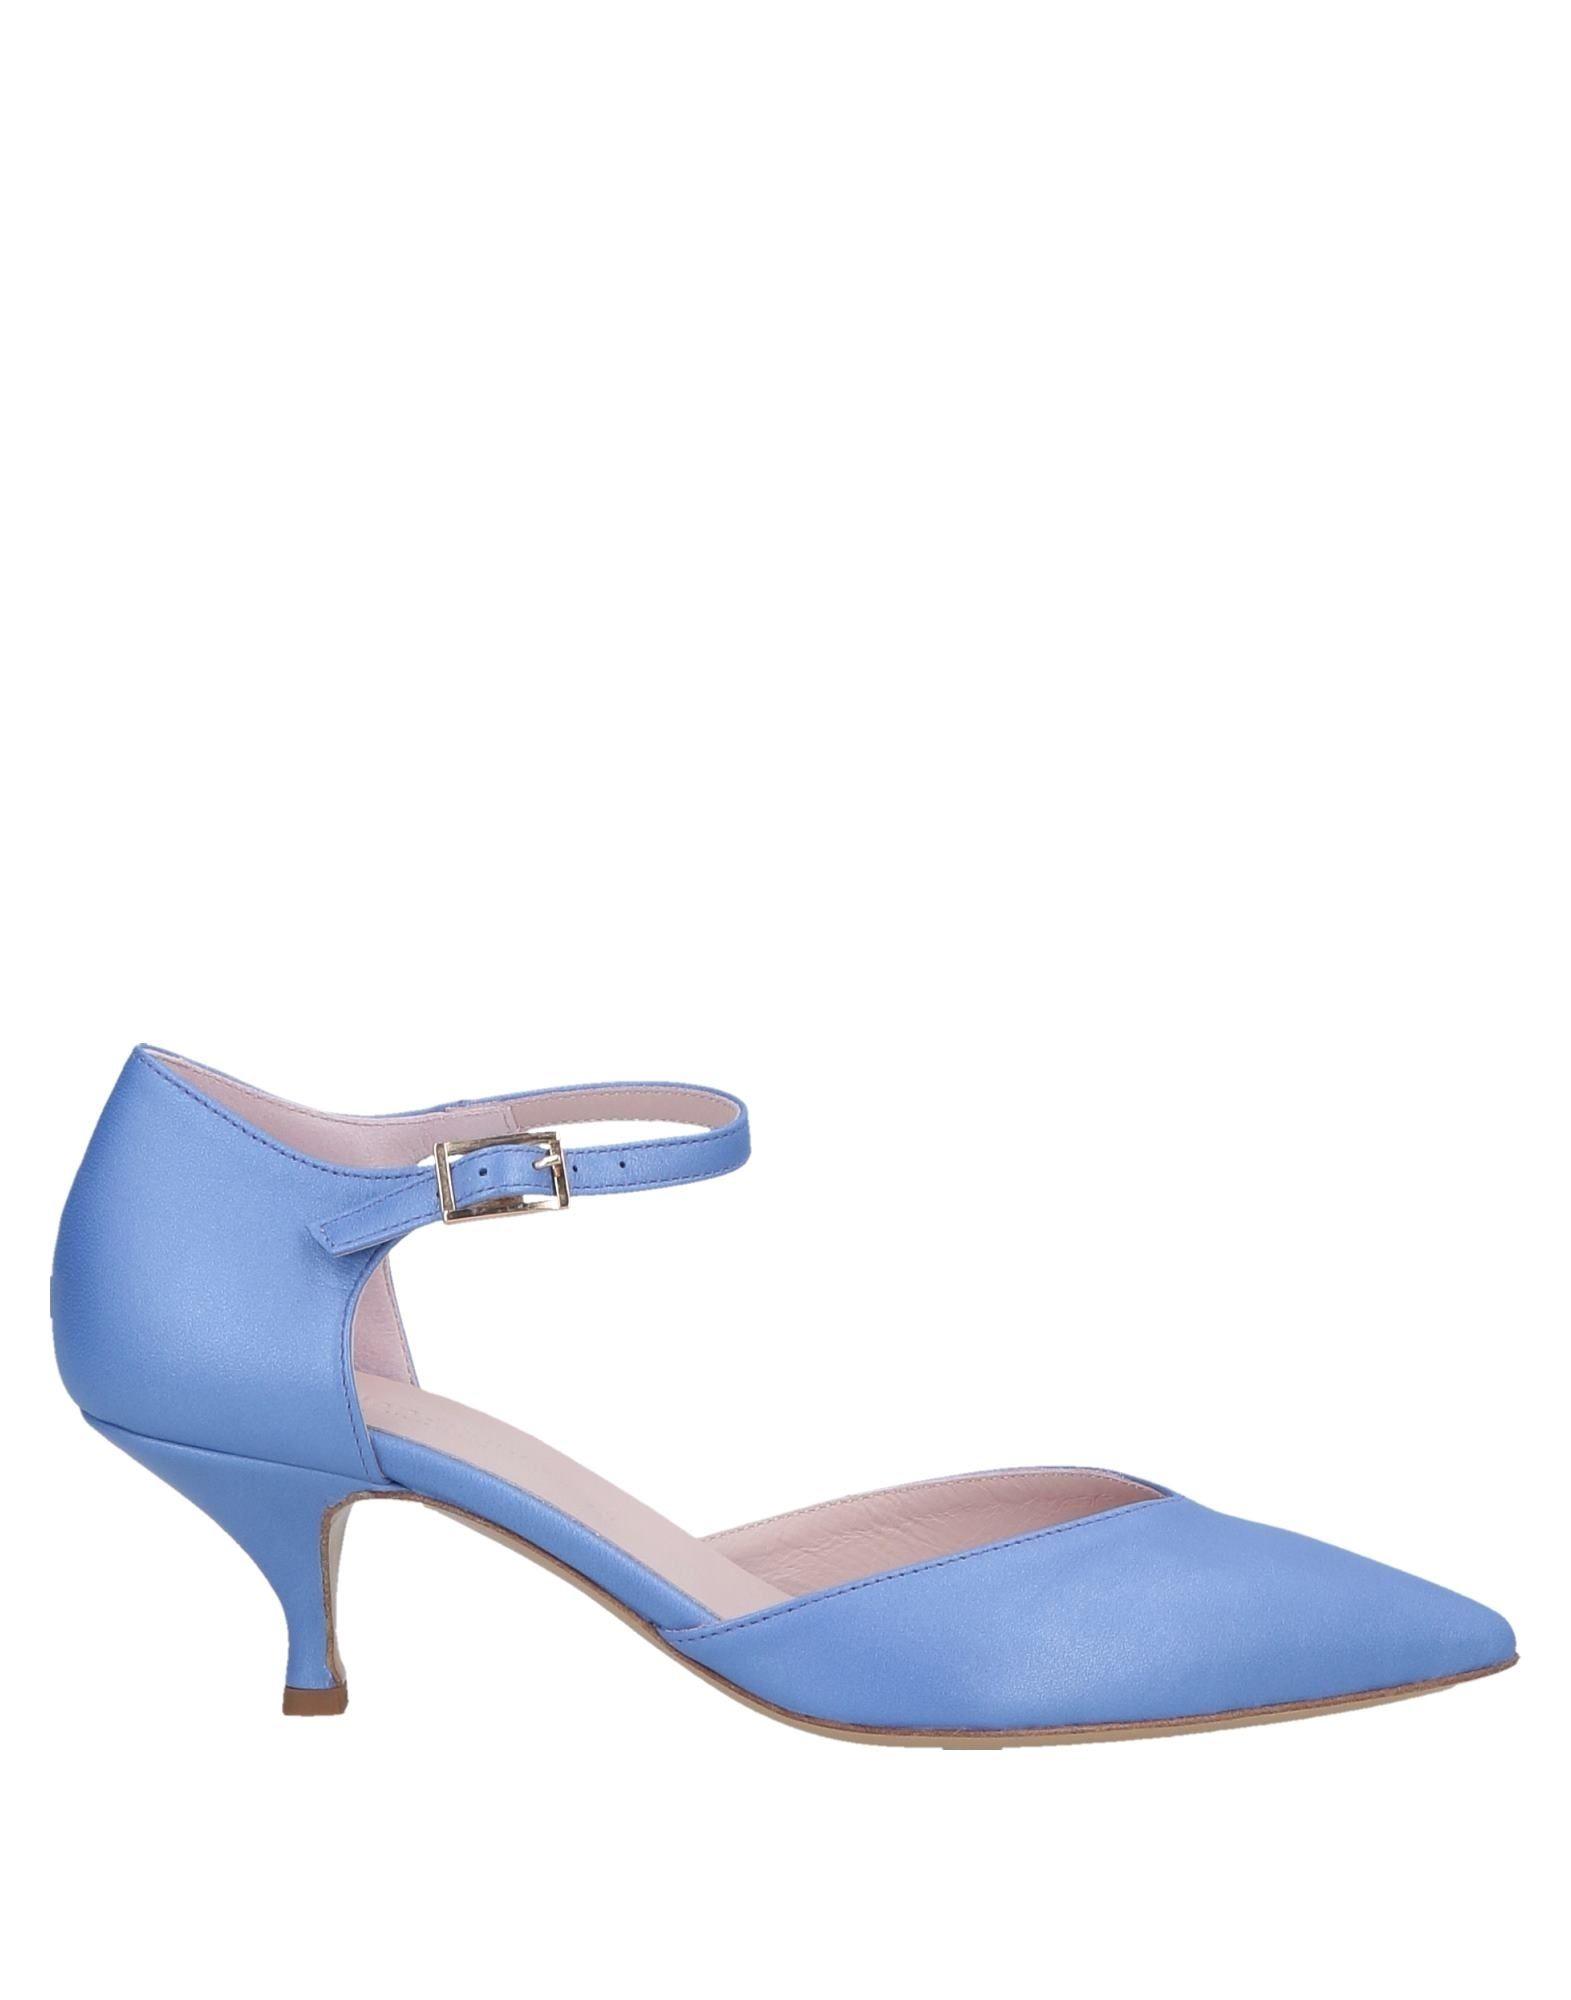 FAUZIAN JEUNESSE Туфли цены онлайн